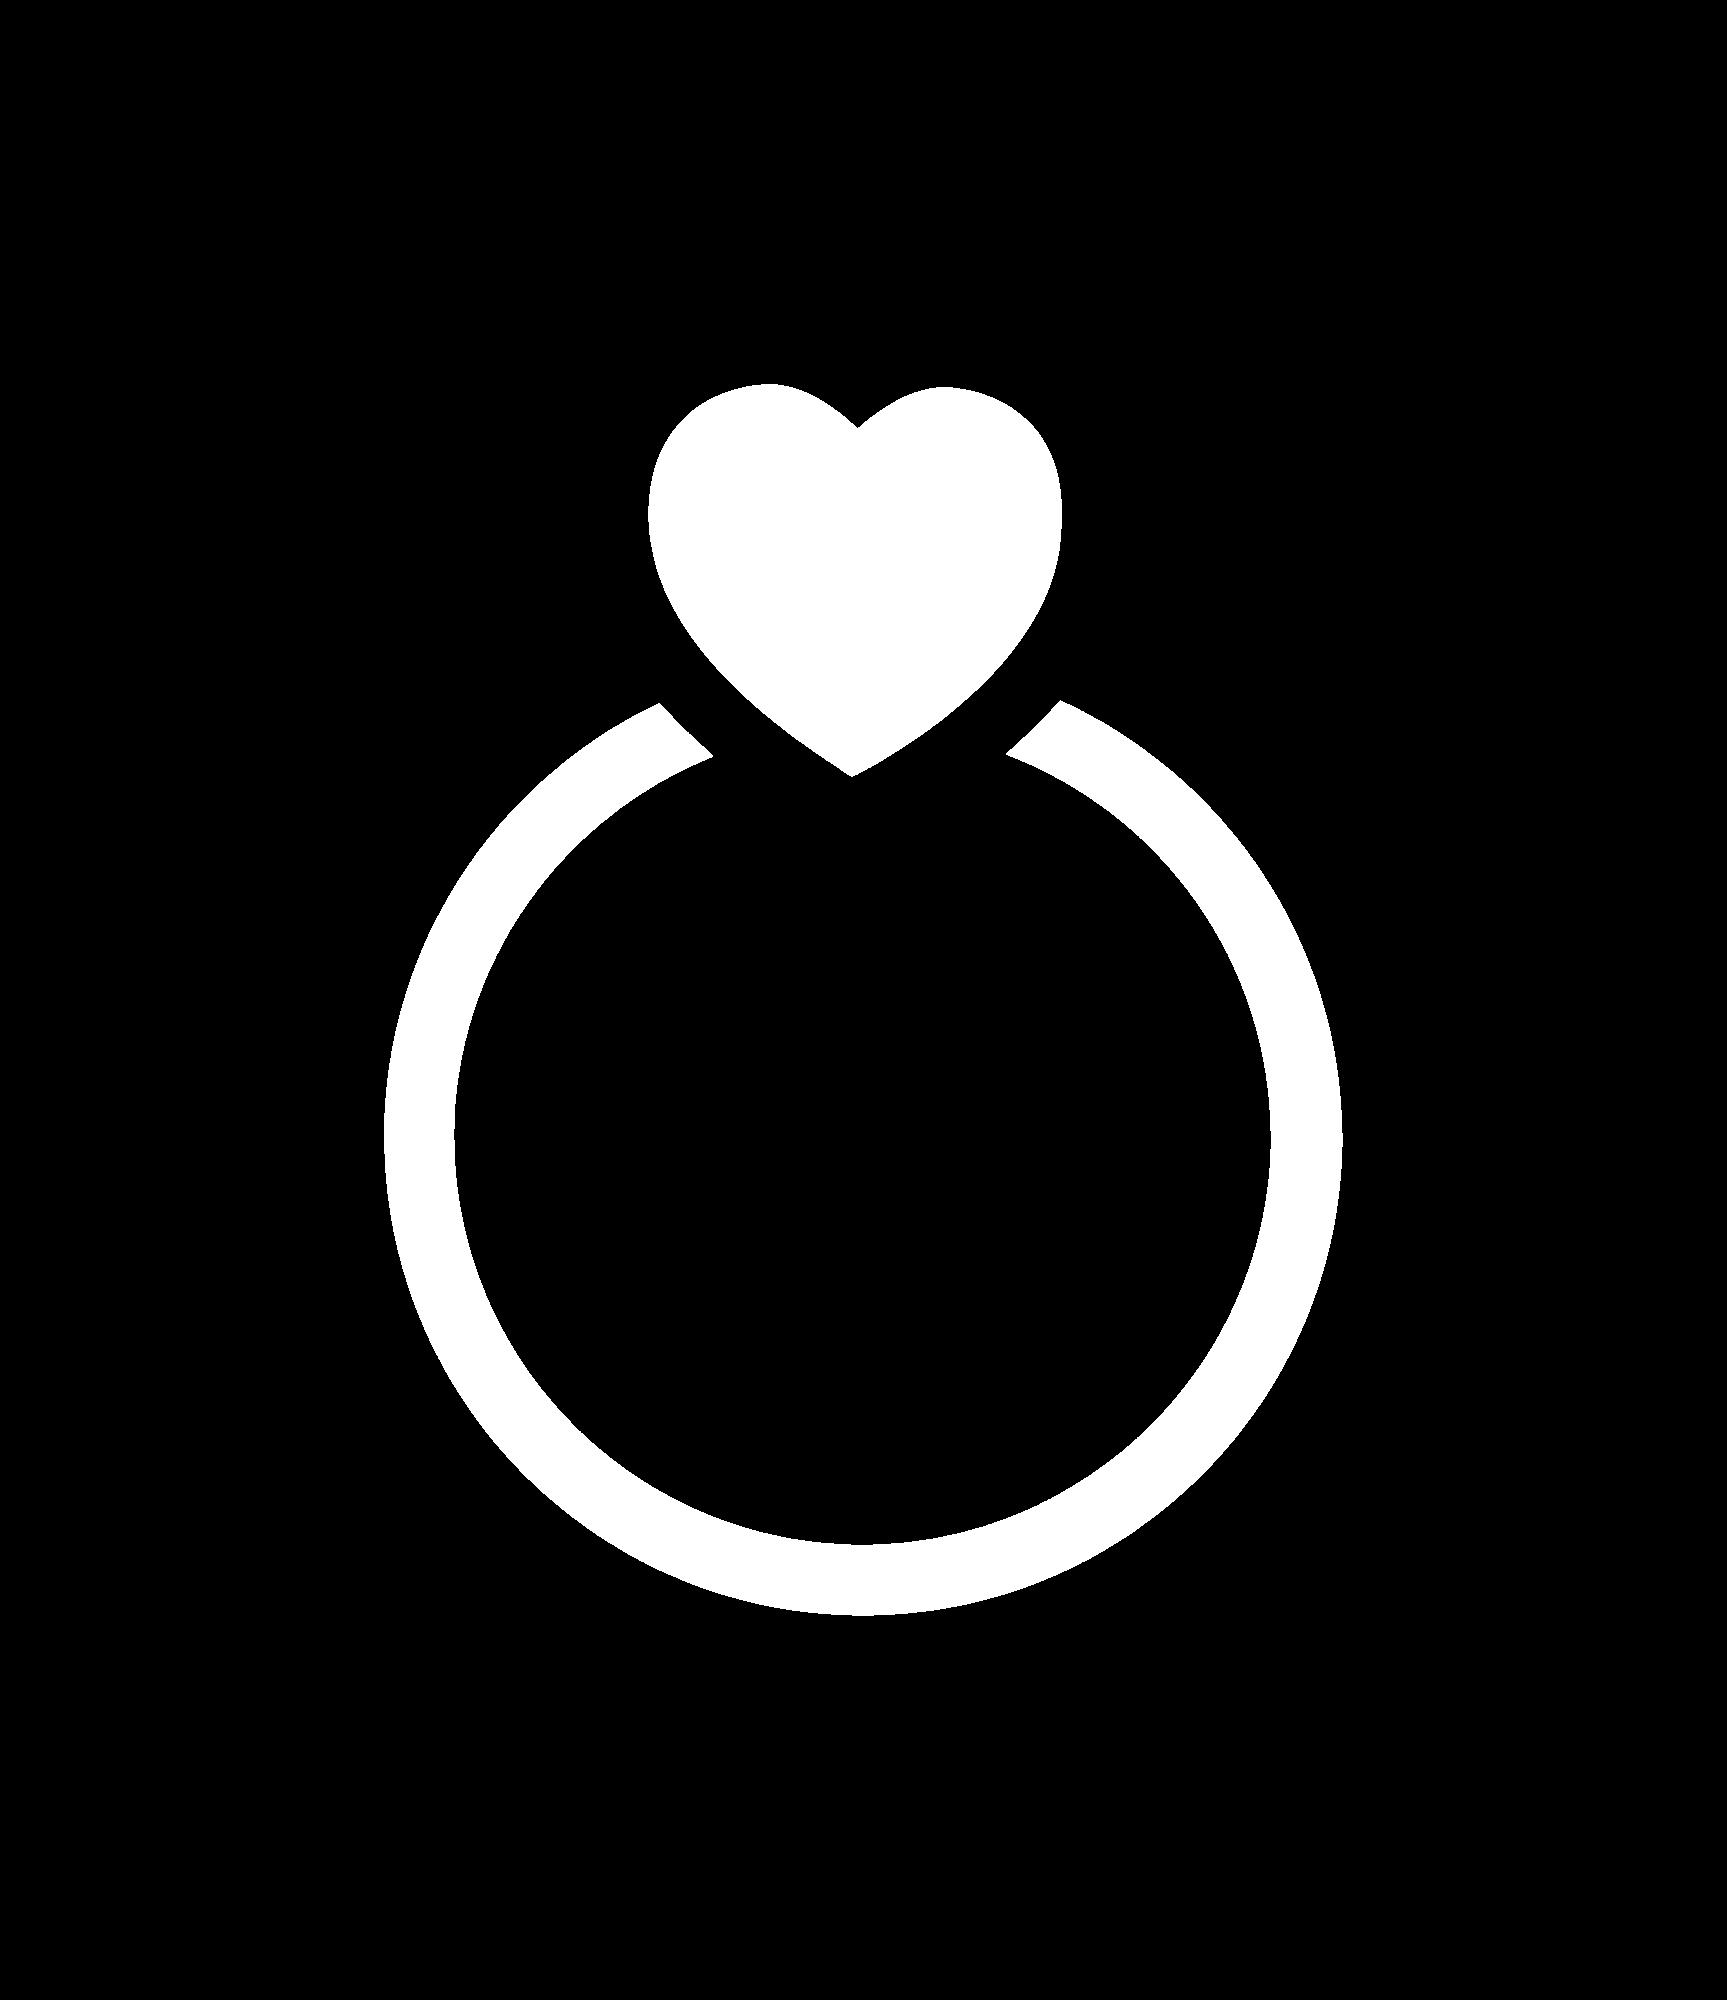 logo-white(8).png